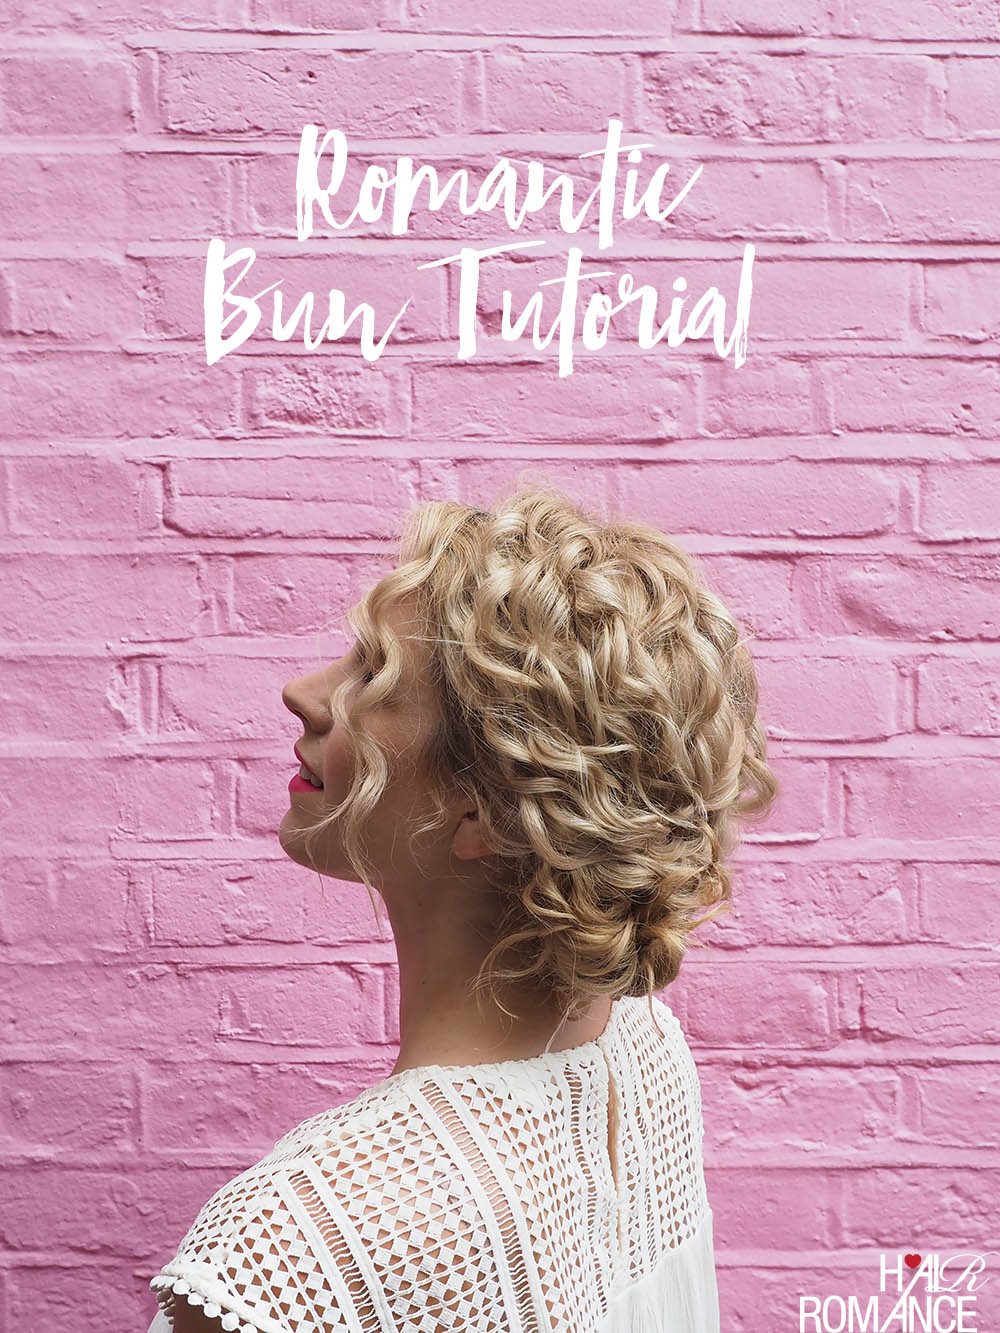 Hair Romance - How to do this quick romantic bun hairstyle tutorial